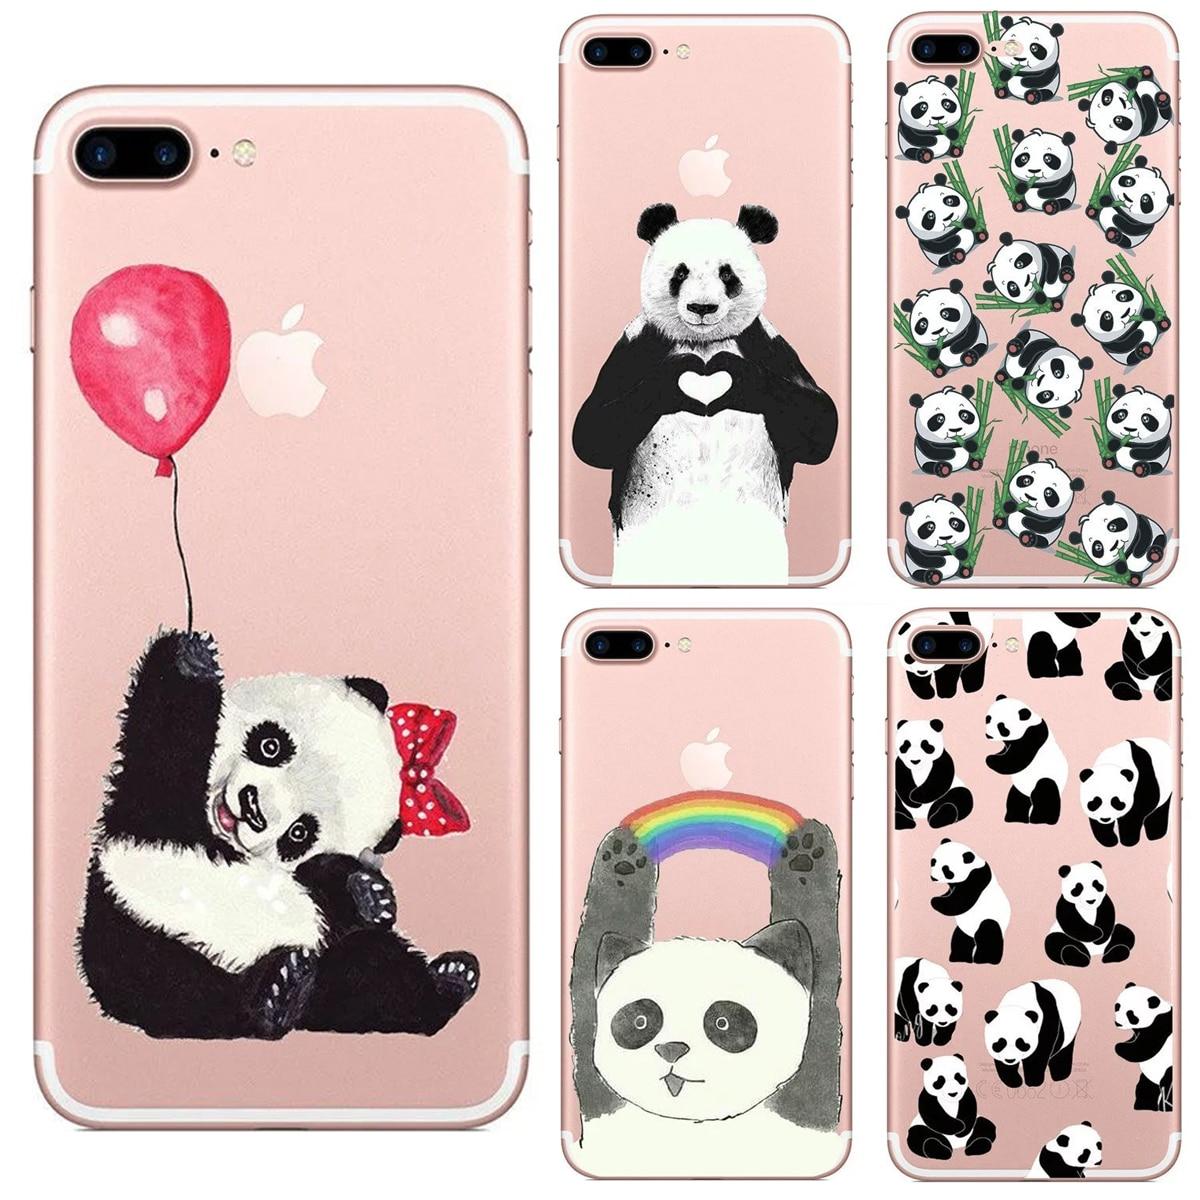 iphone 6 cover cinesi